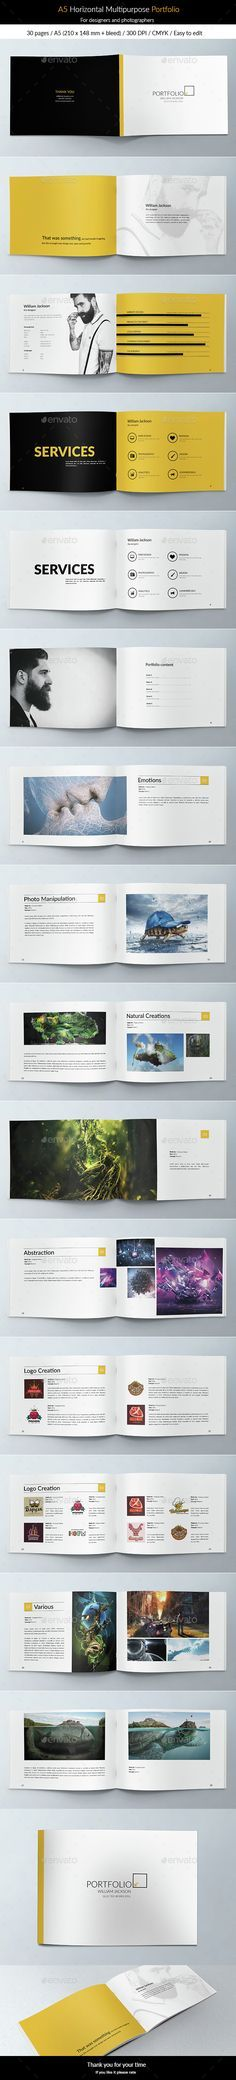 A5 Horizontal Multipurpose Portfolio Brochure Template PSD. Download here: http://graphicriver.net/item/a5-horizontal-multipurpose-portfolio/15221469?ref=ksioks